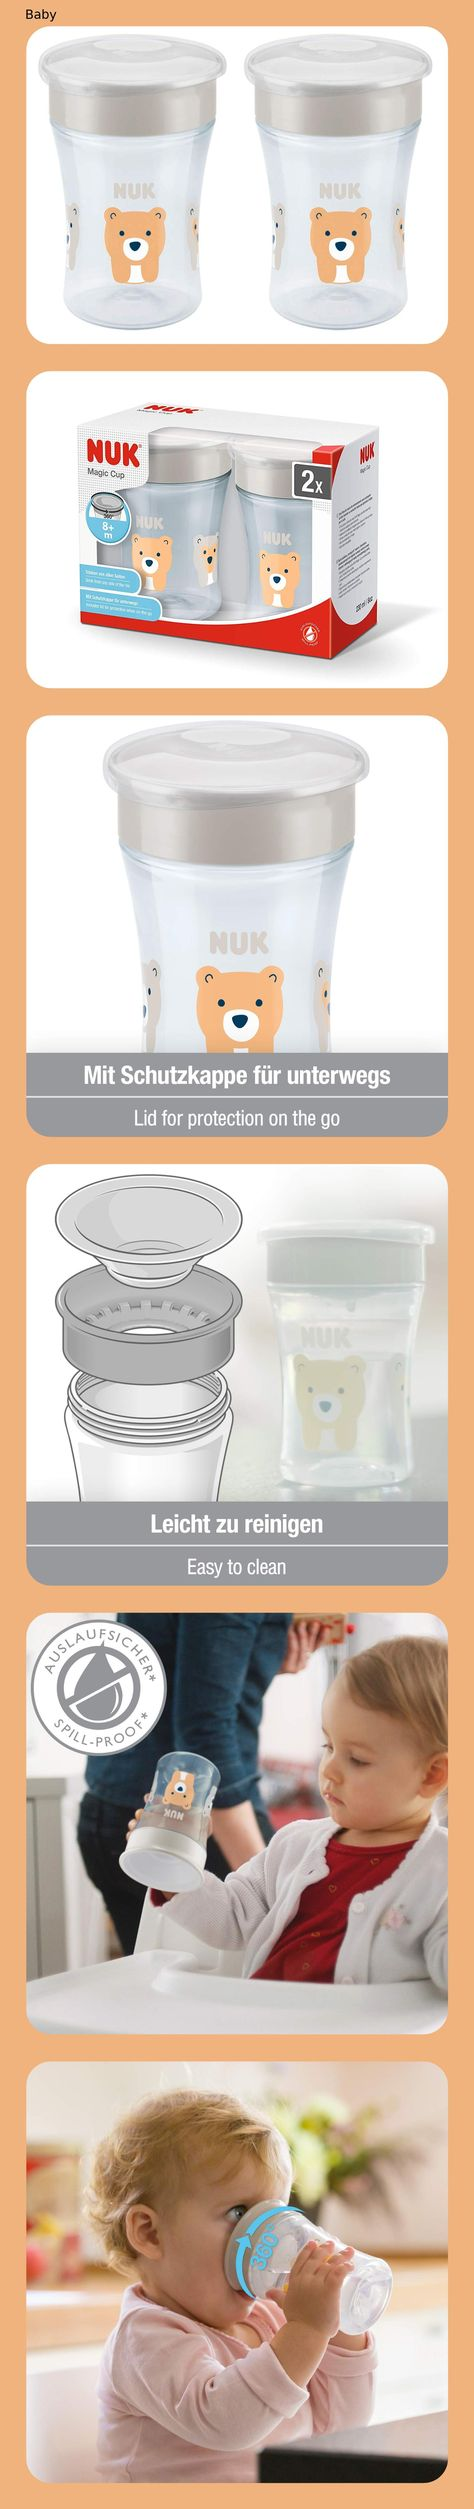 NUK Magic Cup Trinklernbecher 360° Trinkrand 230ml auslaufsicher BPA-frei